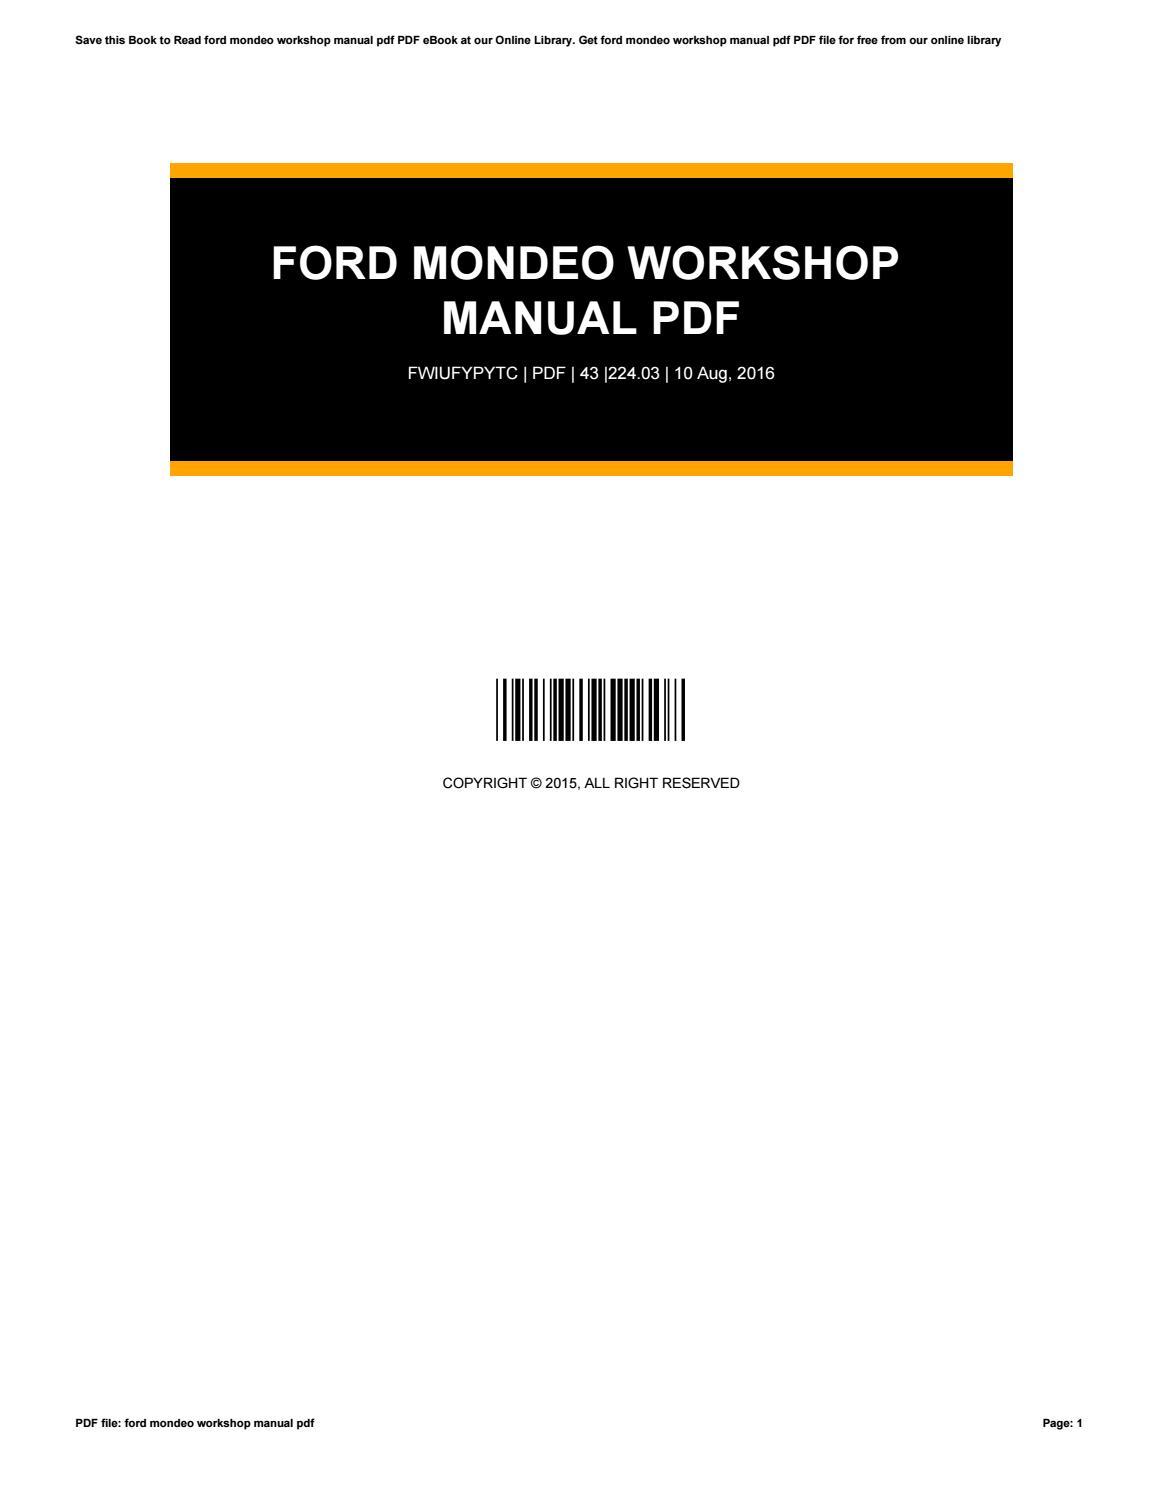 Ford Mondeo Workshop Manual Ebooks Pdf Free 2019 Ebook